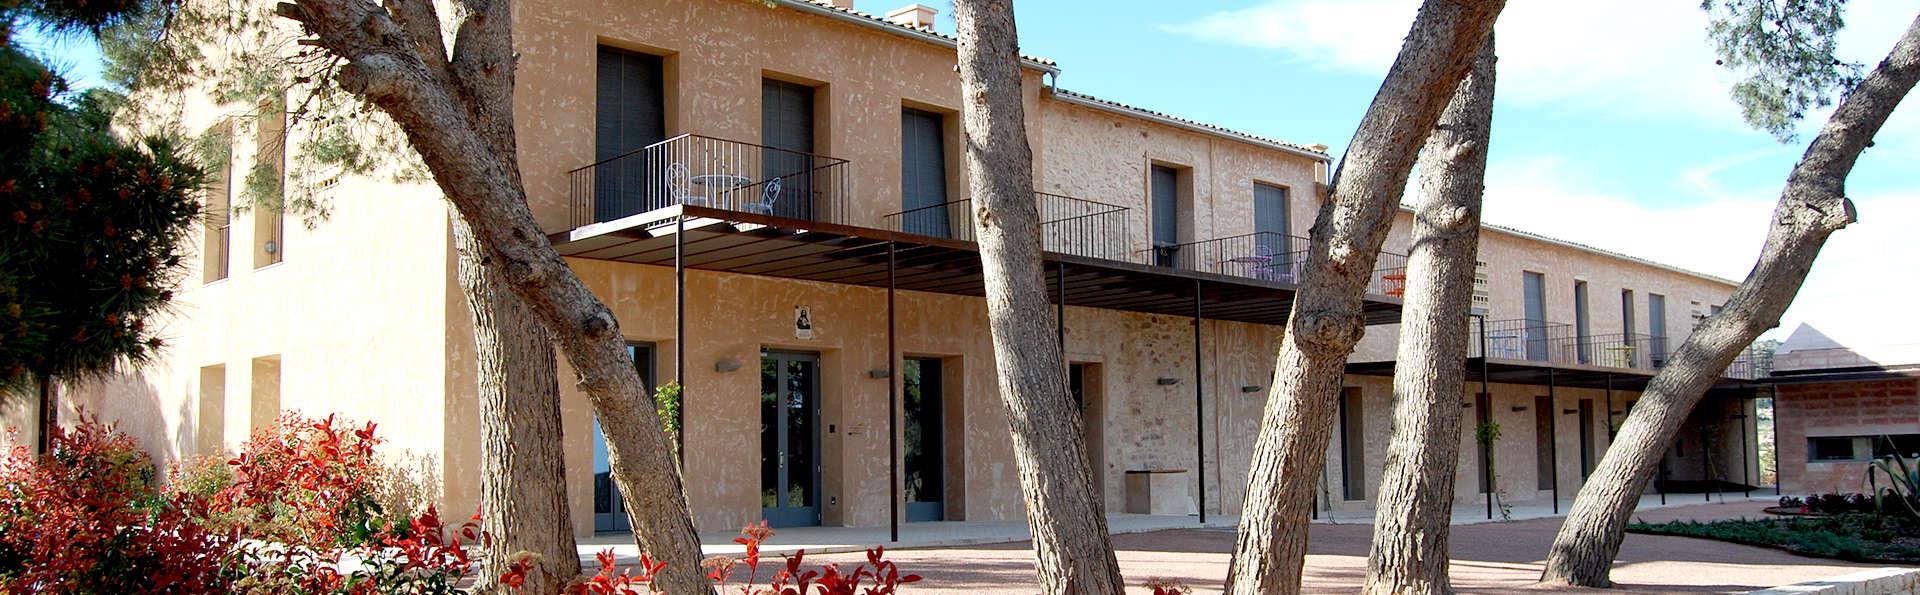 Hotel Spa La Romana - Edit_Front3.jpg